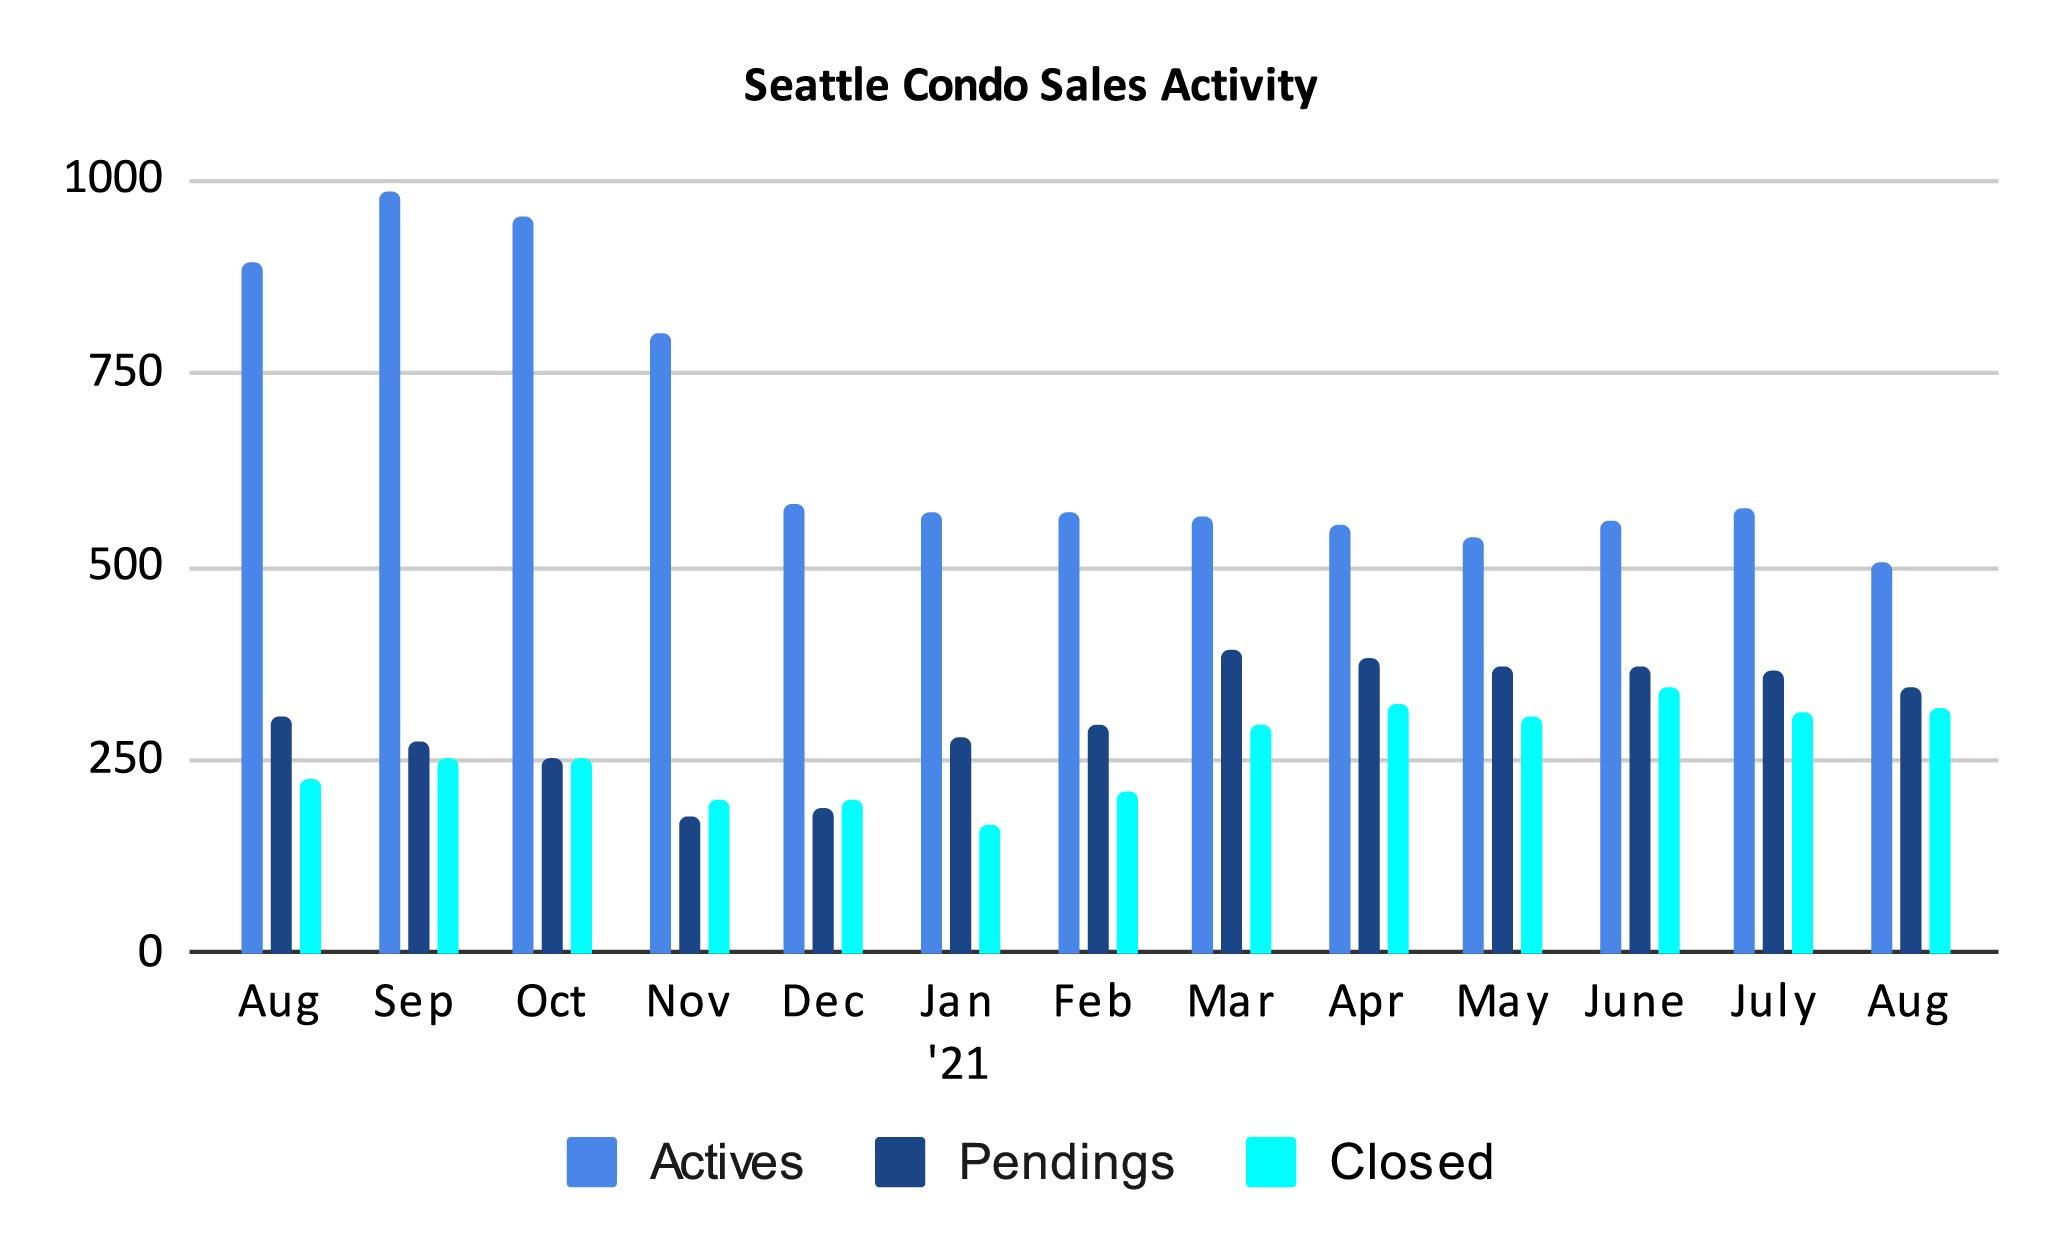 Seattle Condo Sales Activity August 2021